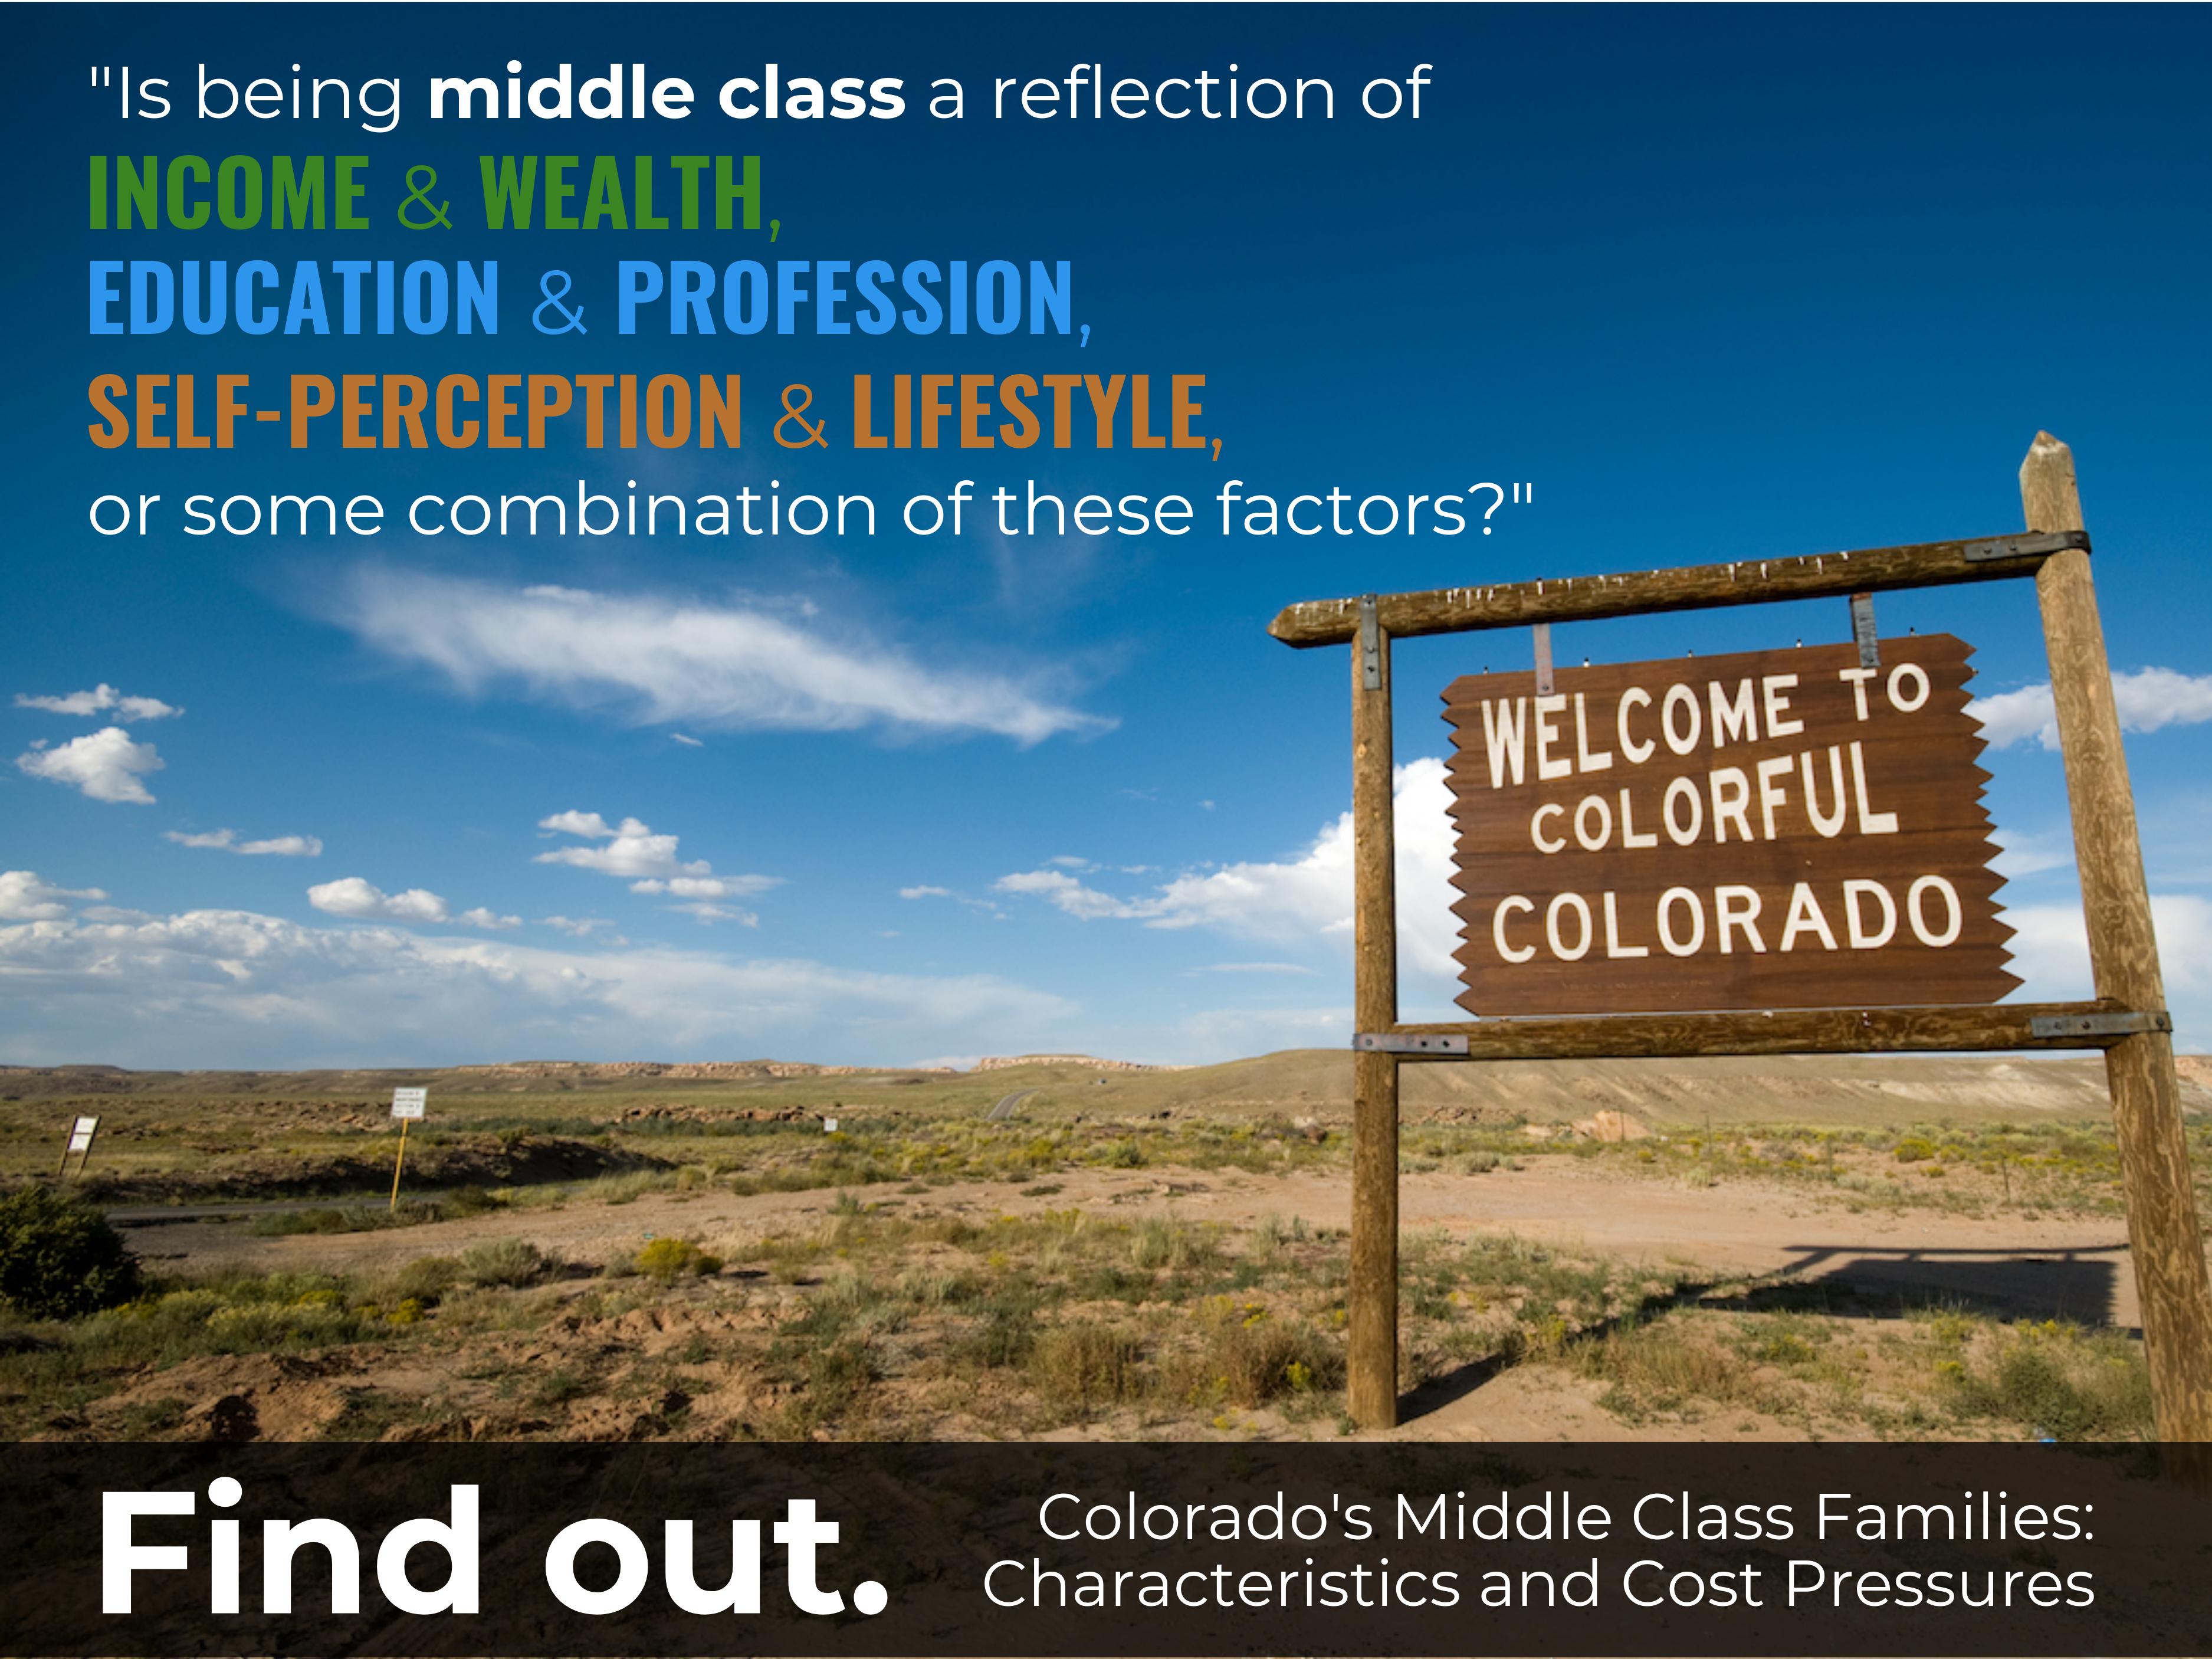 Colorado middle class families